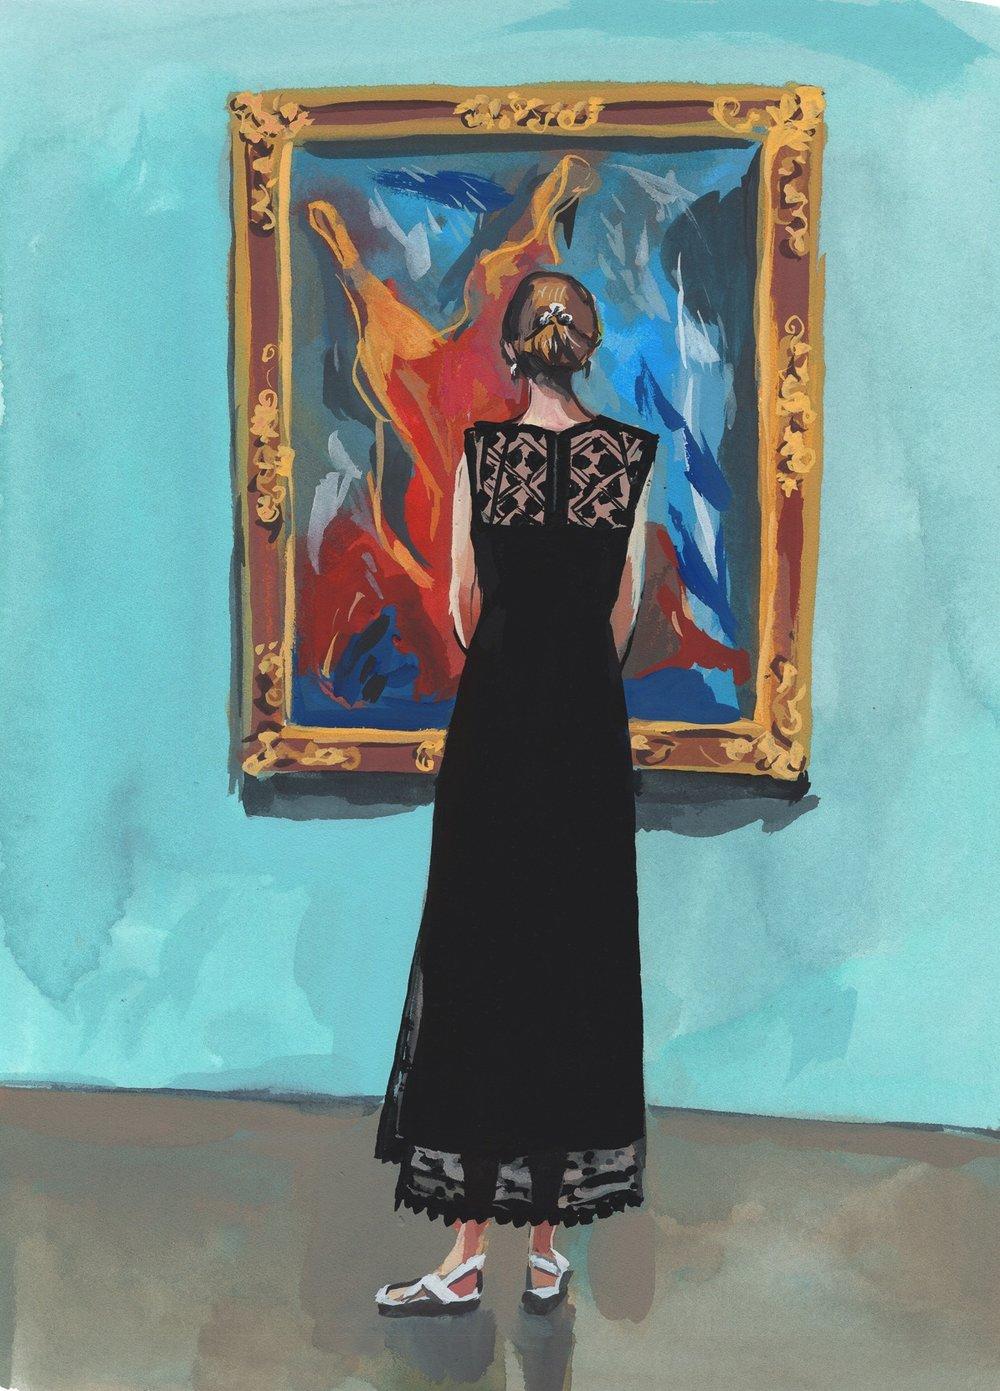 SOI 61 2018 - ARTIST: Jenny KroikTITLE: Soutine [5 of 6]